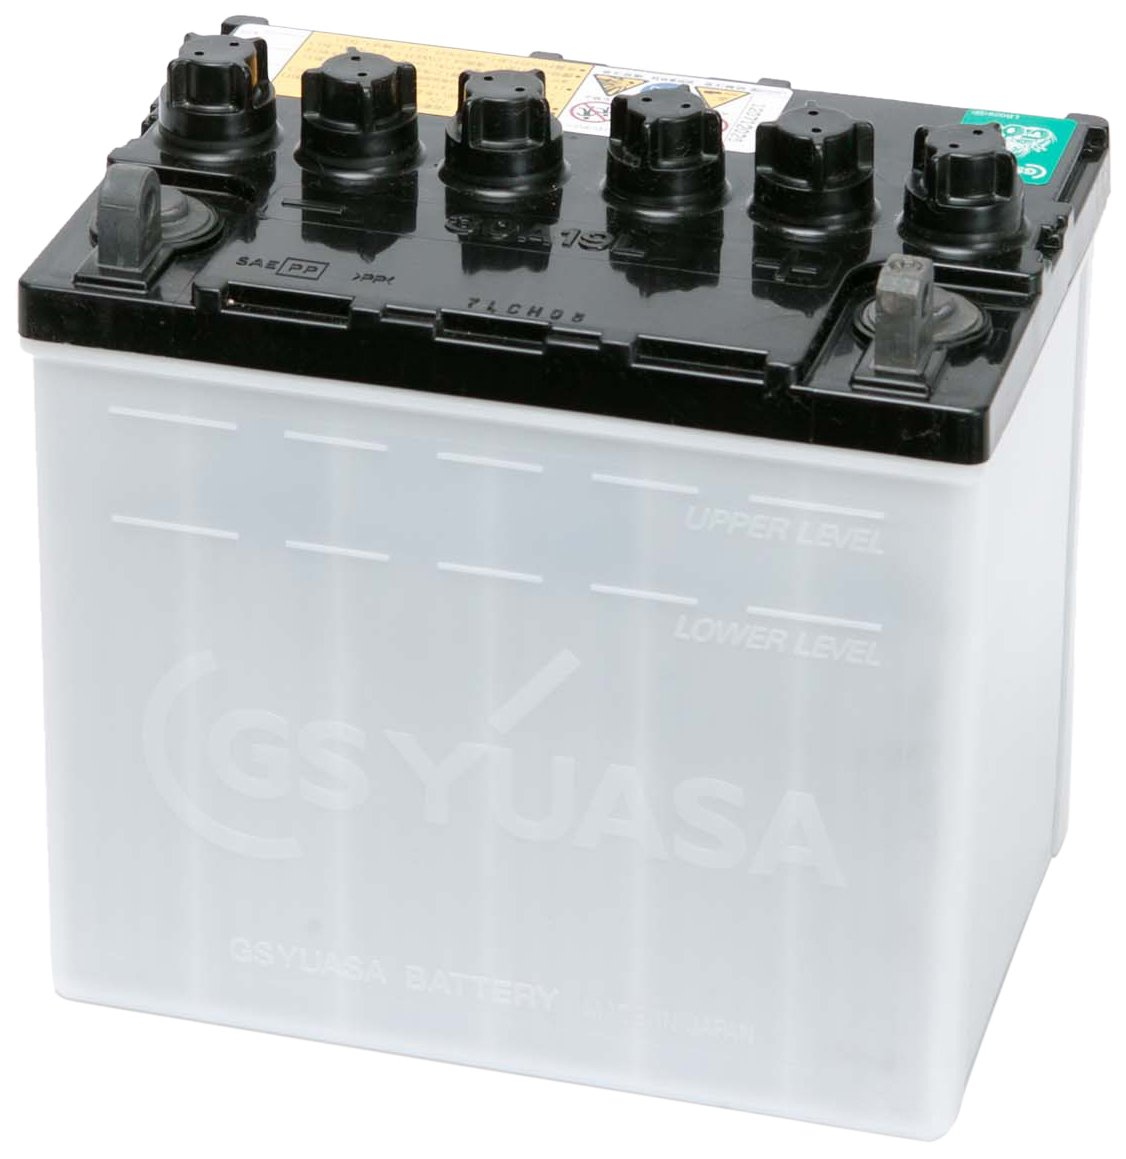 GS YUASA [ ジーエスユアサ ] 農業機械用 バッテリー [ 国産車 ] GYN 80D26R B008UJ3MDU